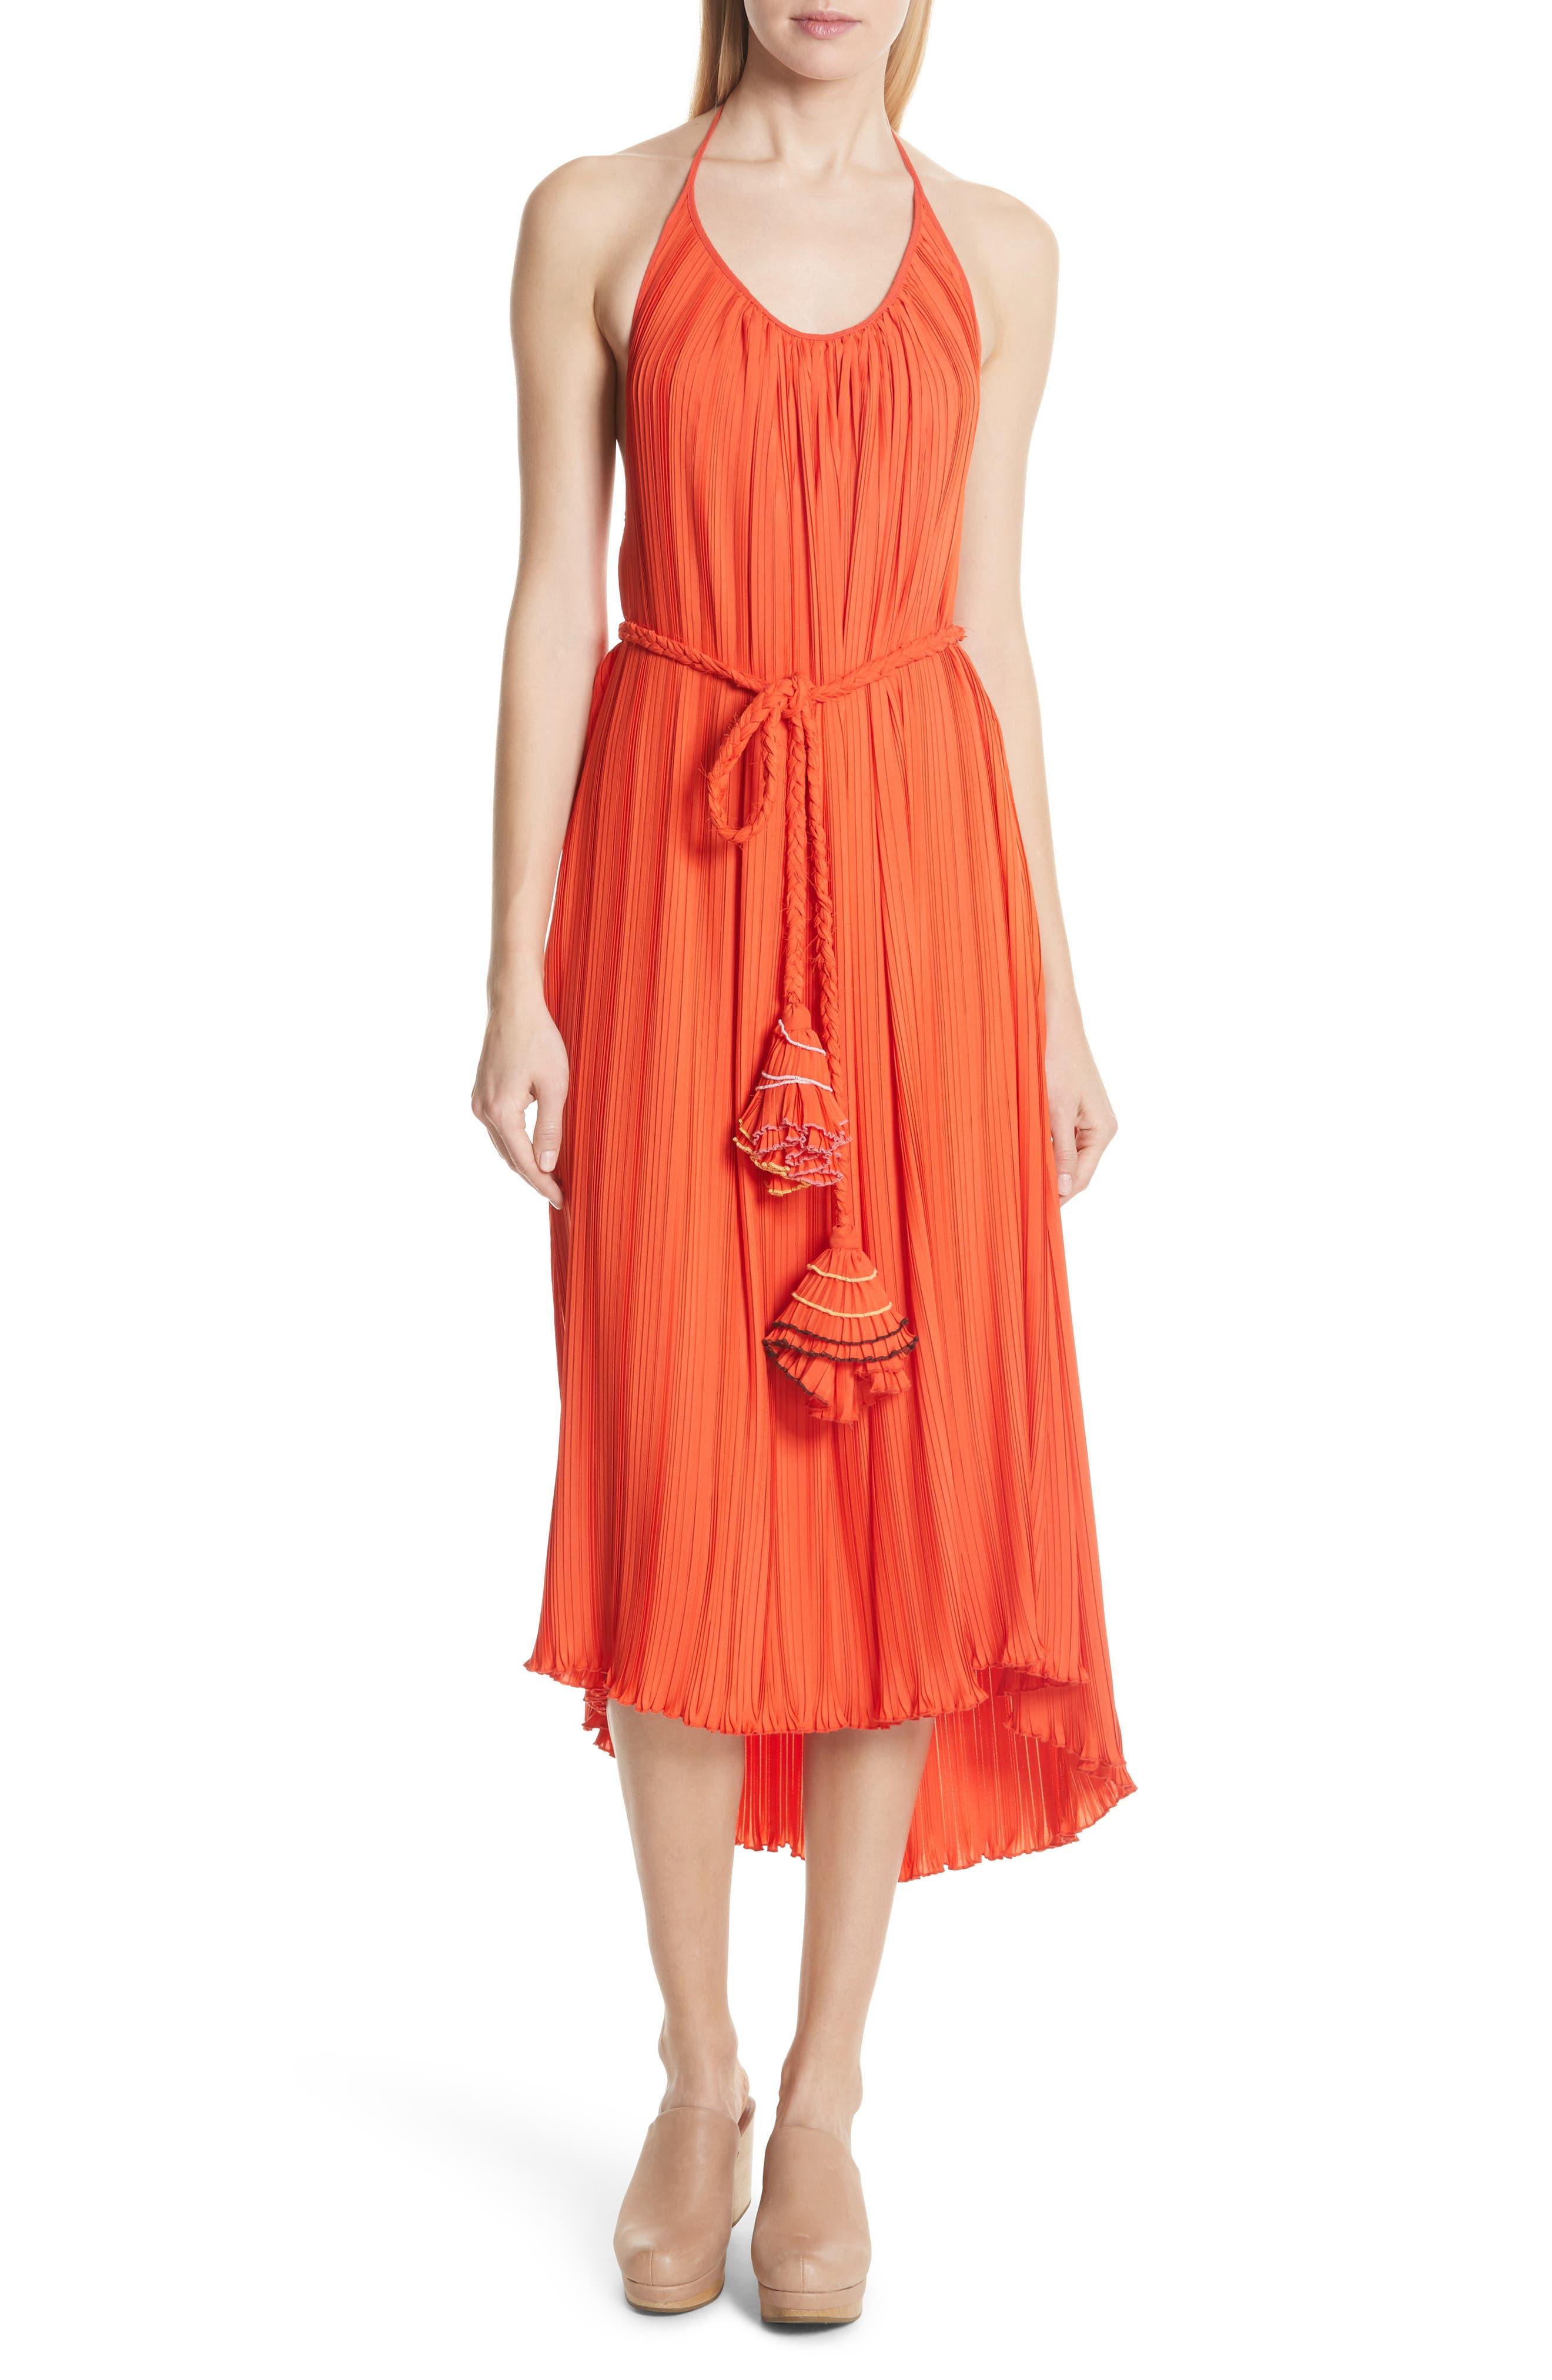 RACHEL COMEY Sambuca Halter Dress, Main, color, 959